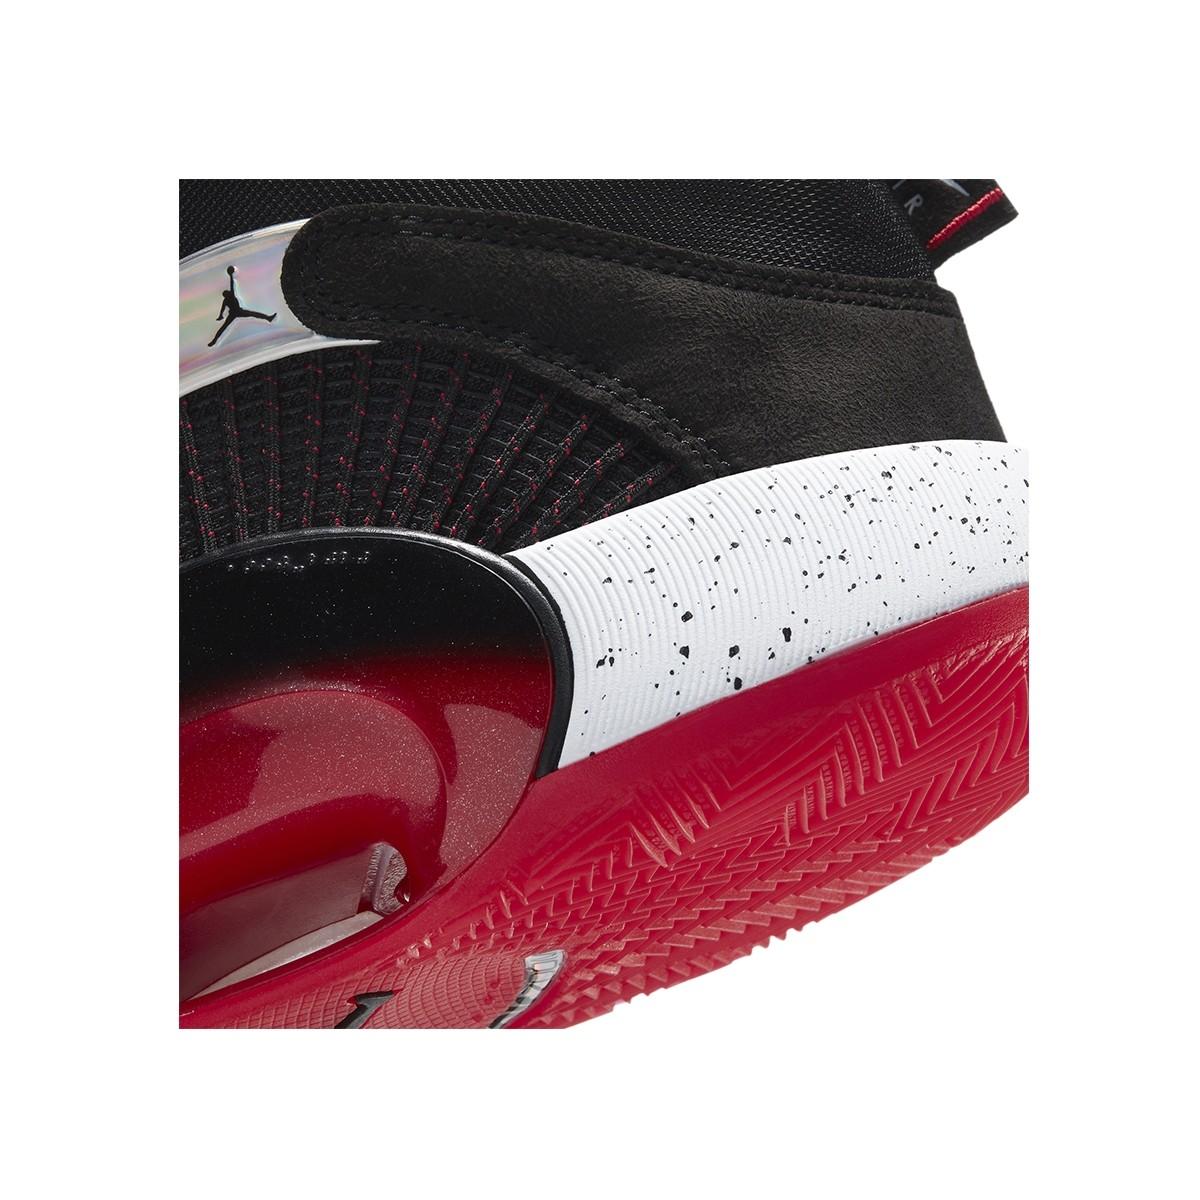 Air Jordan 35 'Bred'-CQ4227-030